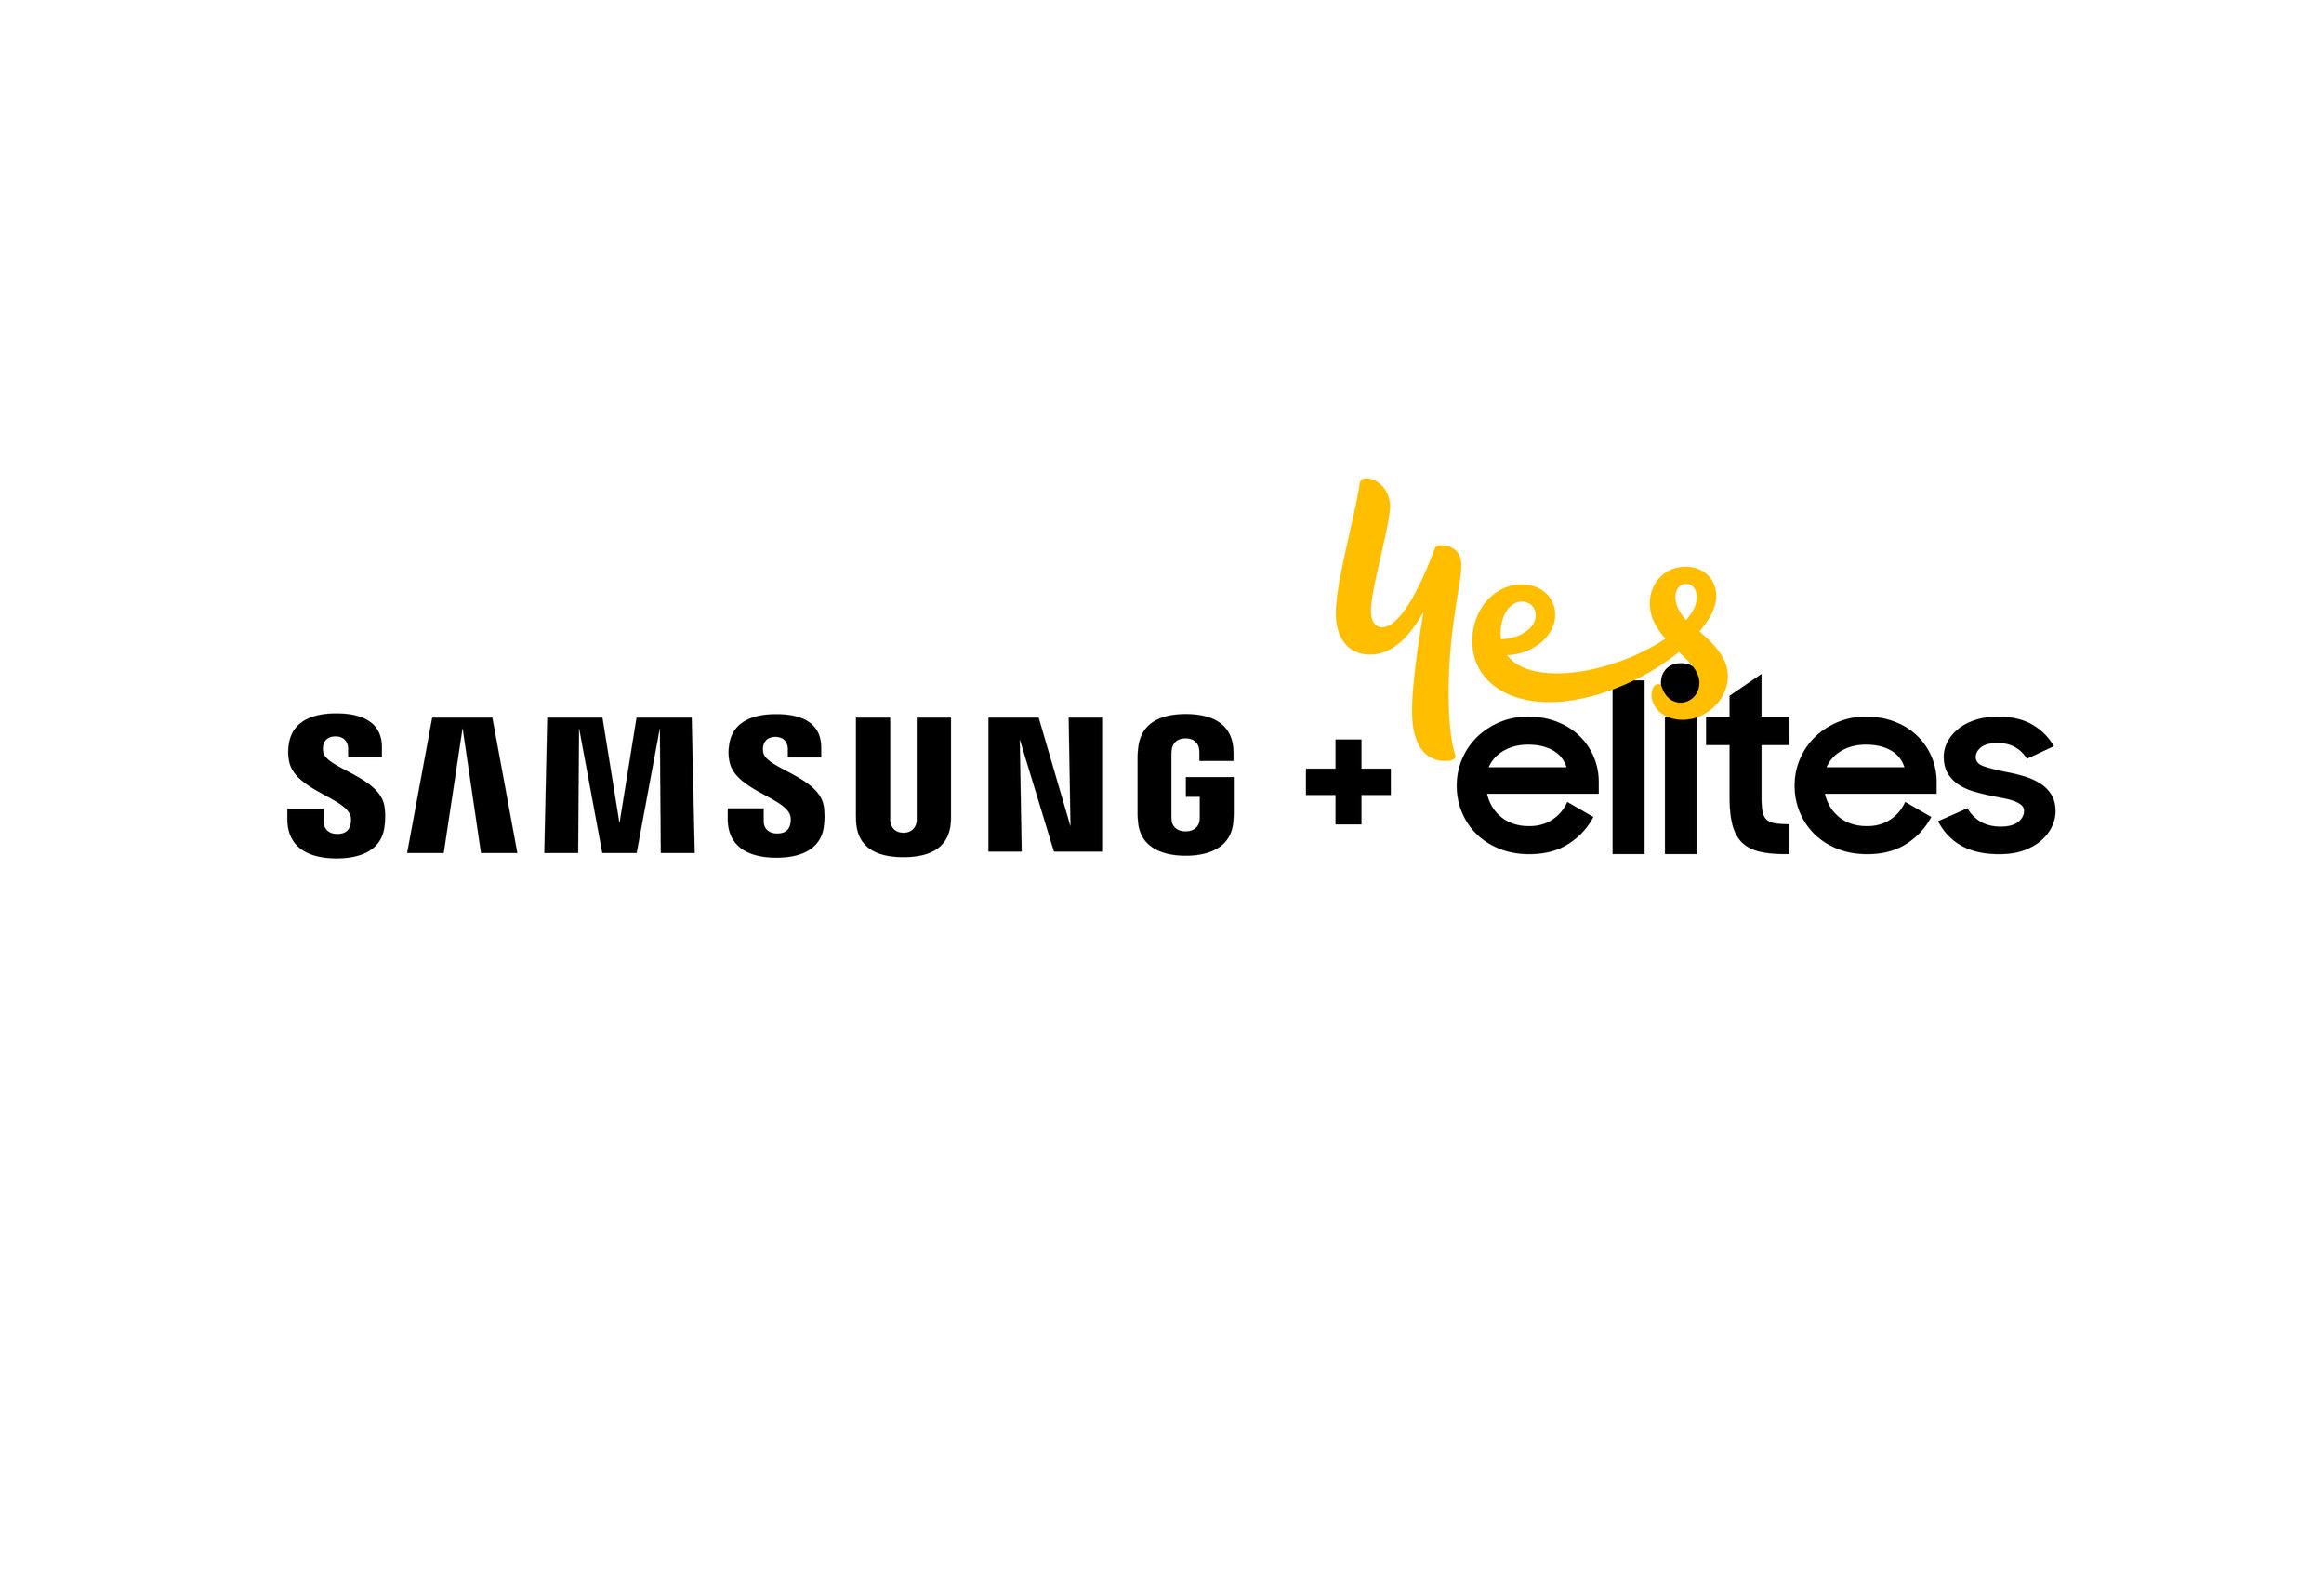 Samsung Plus Elite logo (Optus)